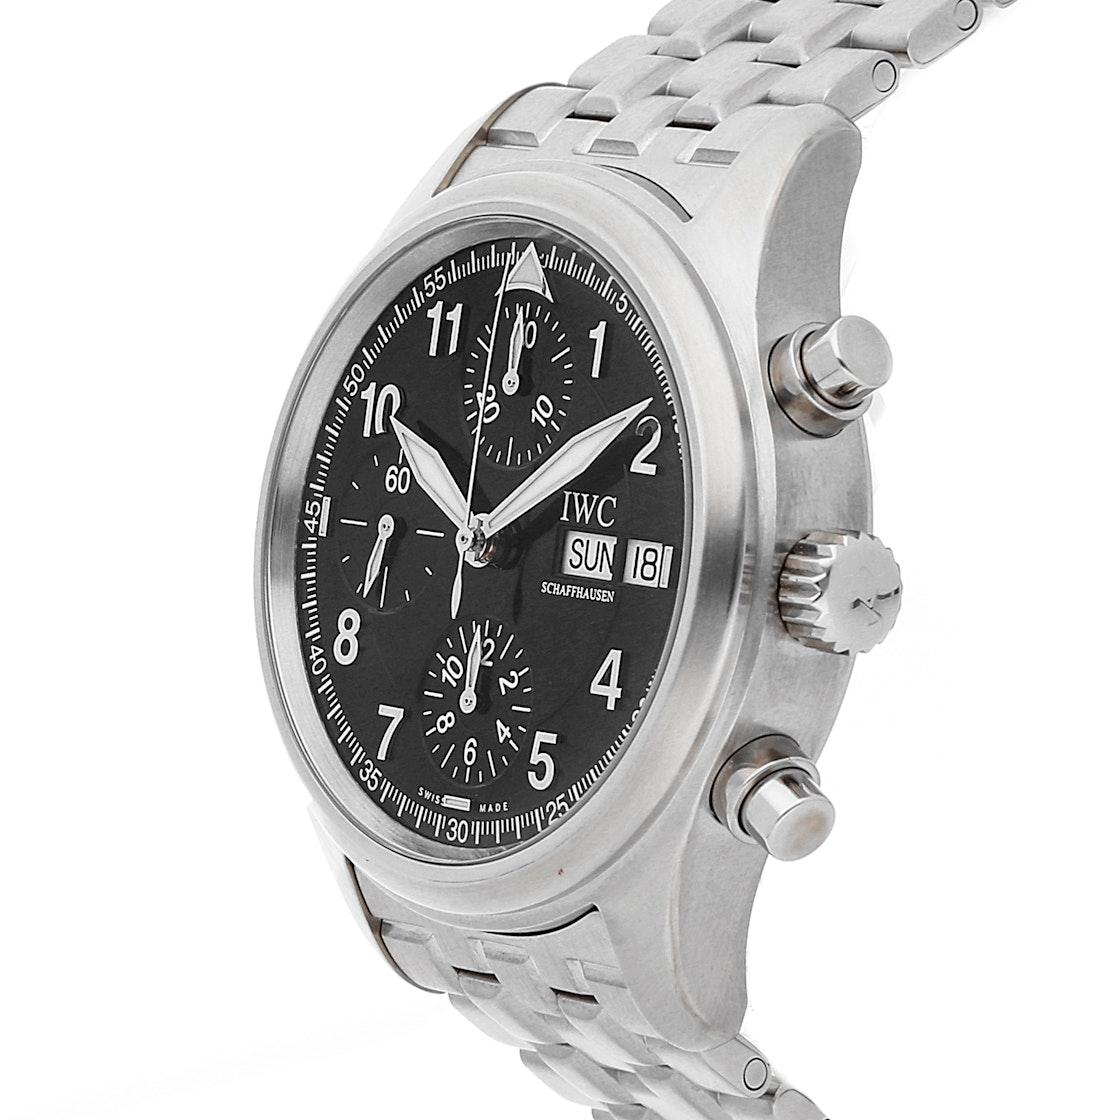 IWC Pilot Spitfire Chronograph IW3706-18